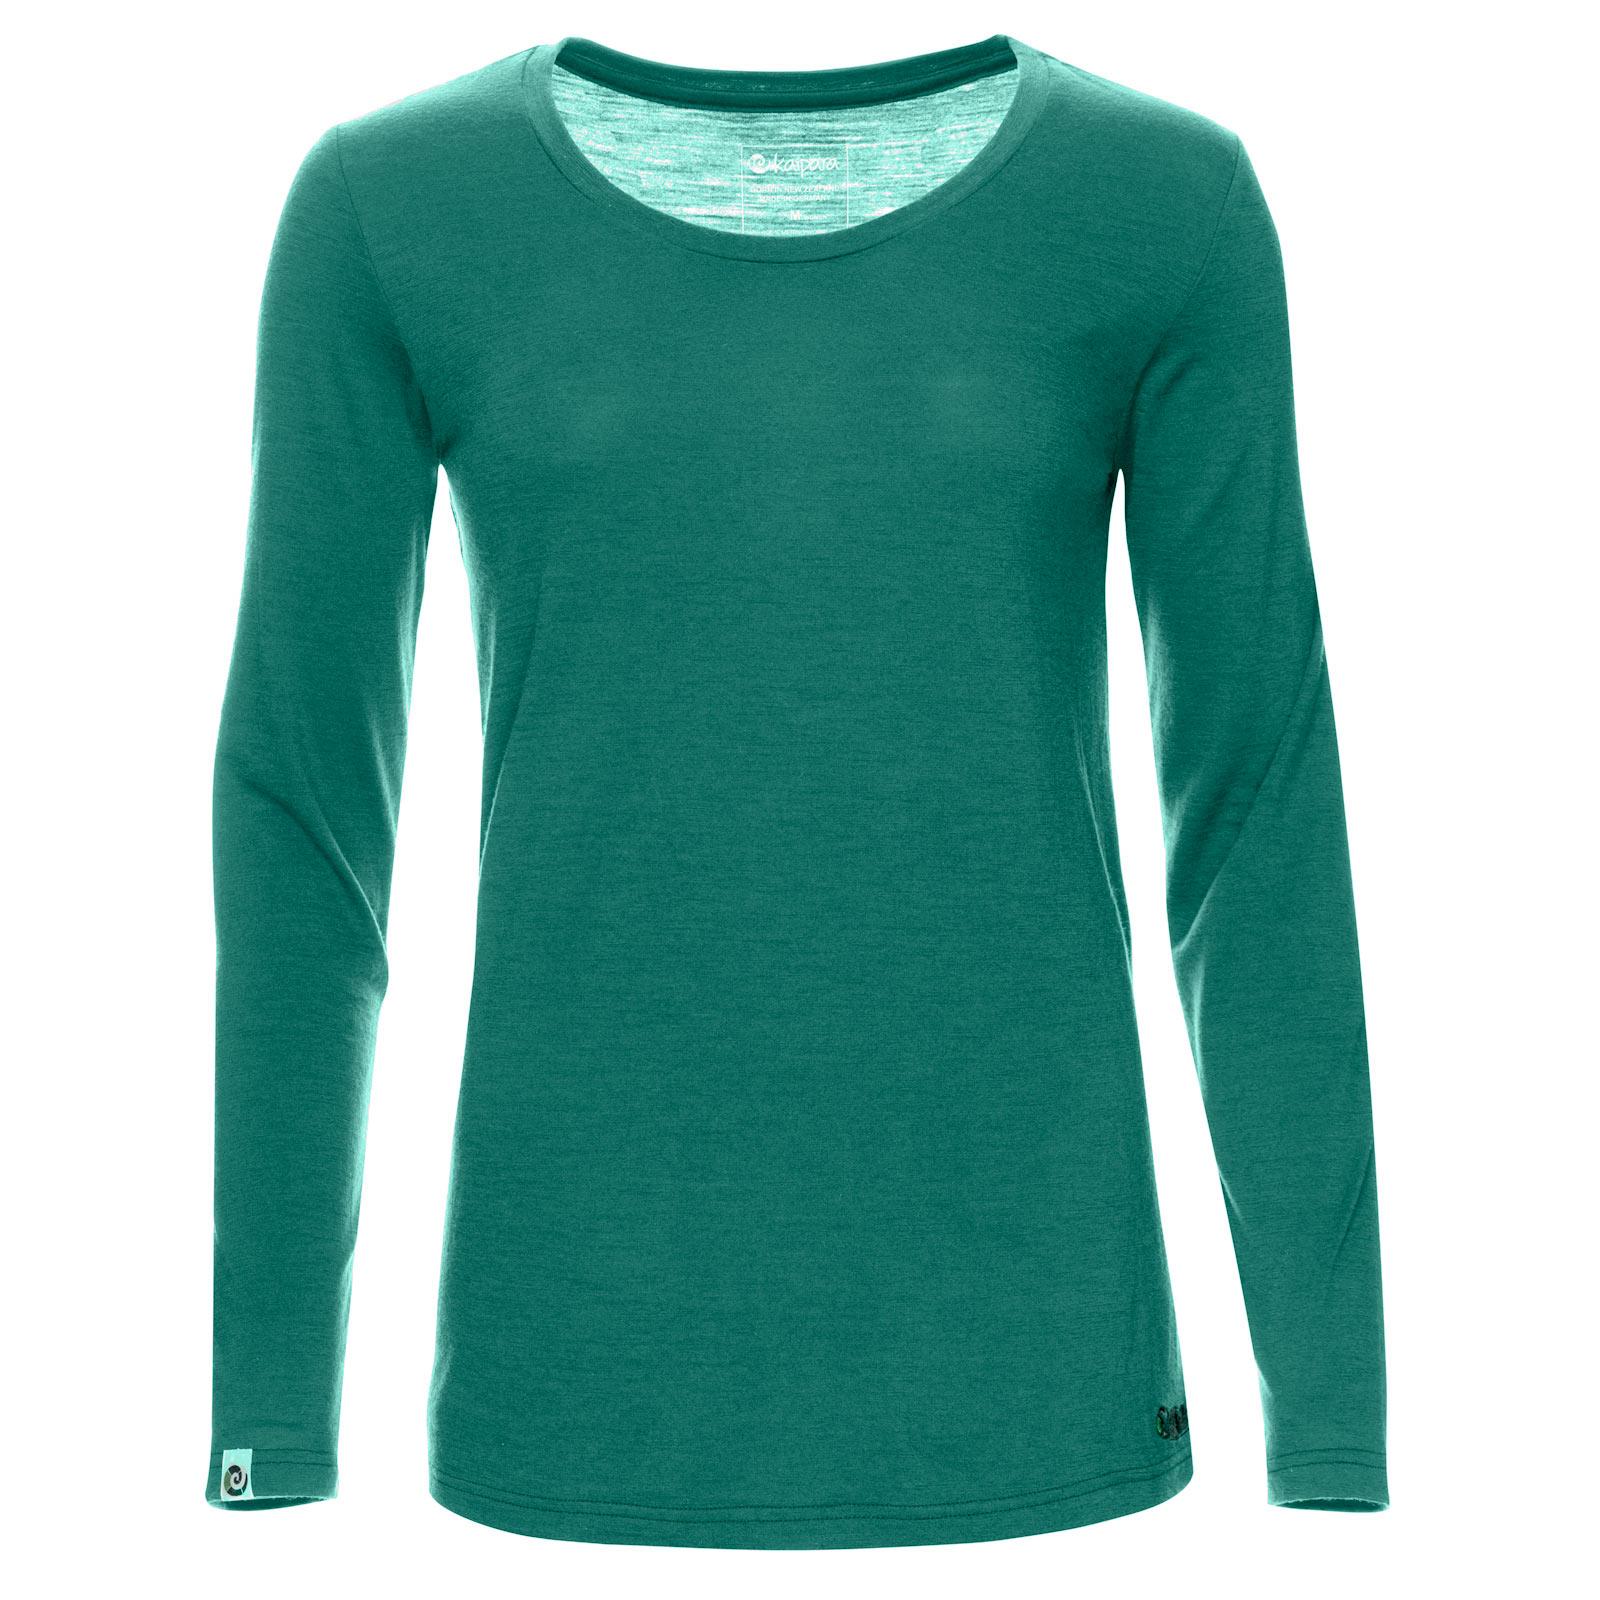 Merino Longsleeve Damen Regular 150 Smaragd XL